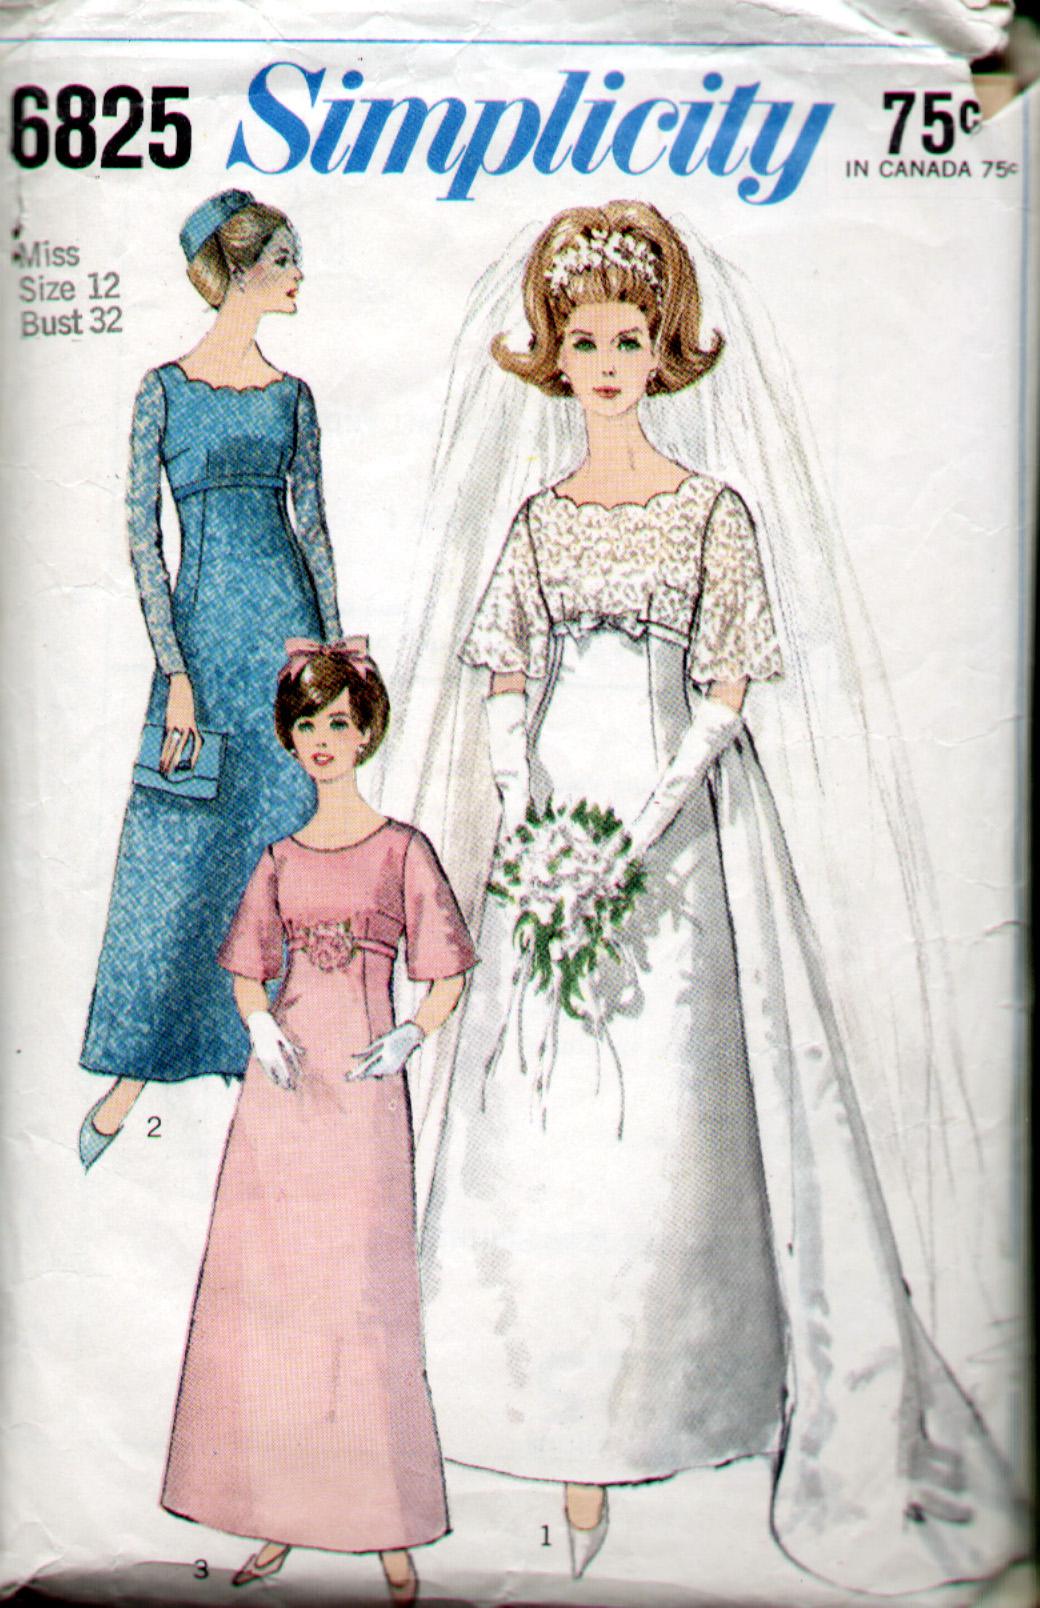 Audrey Hepburn Dresses